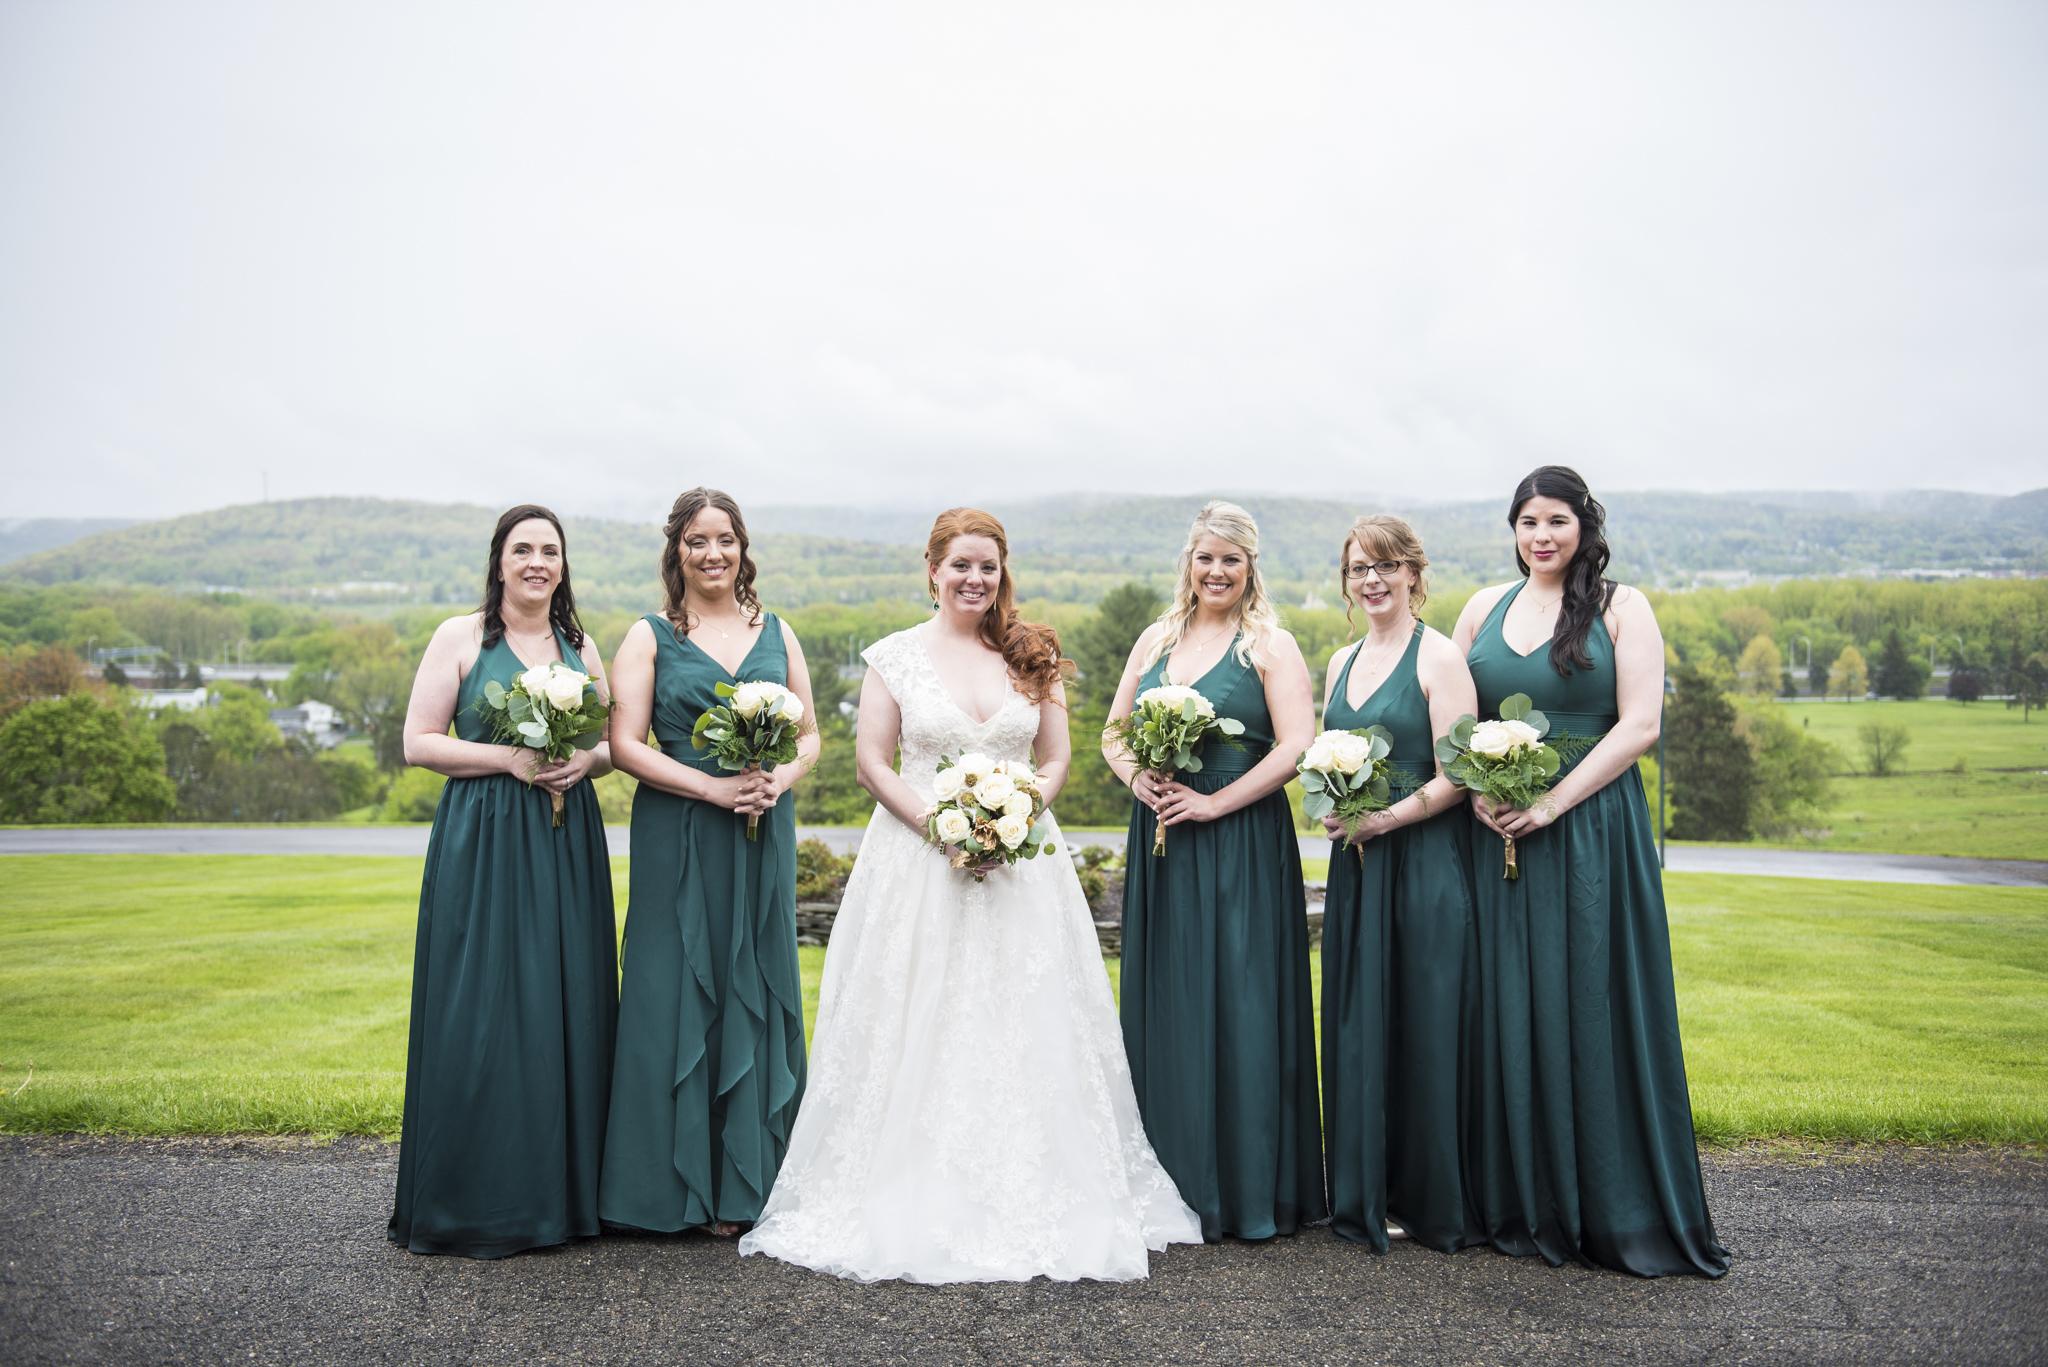 JB-Wedding-Online-Bridals-17.jpg